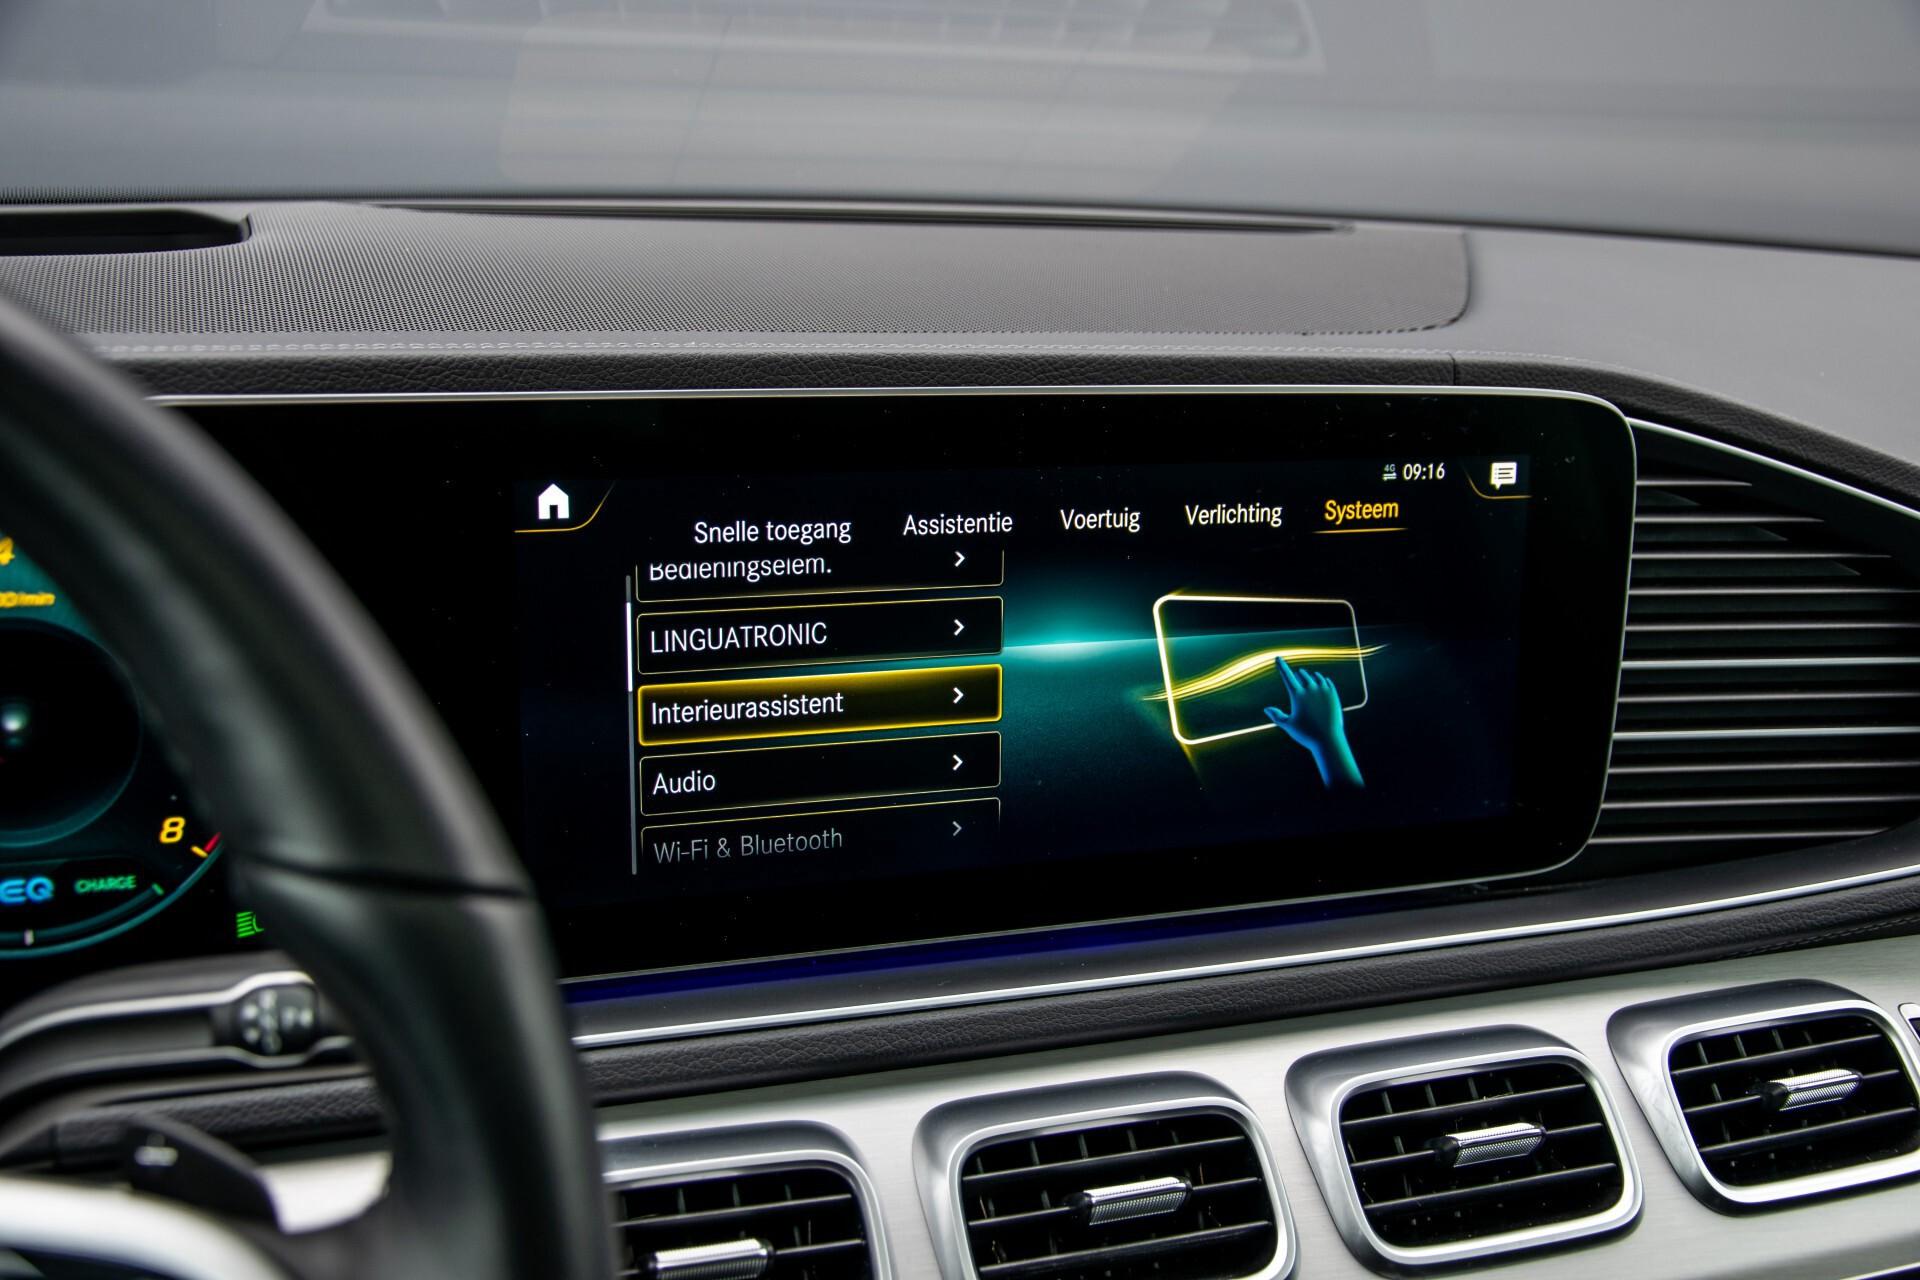 Mercedes-Benz GLE 450 4-M 7-Persoons AMG Massage/Rij-assist/Keyless/TV/360/Night/Trekhaak Aut9 Foto 54